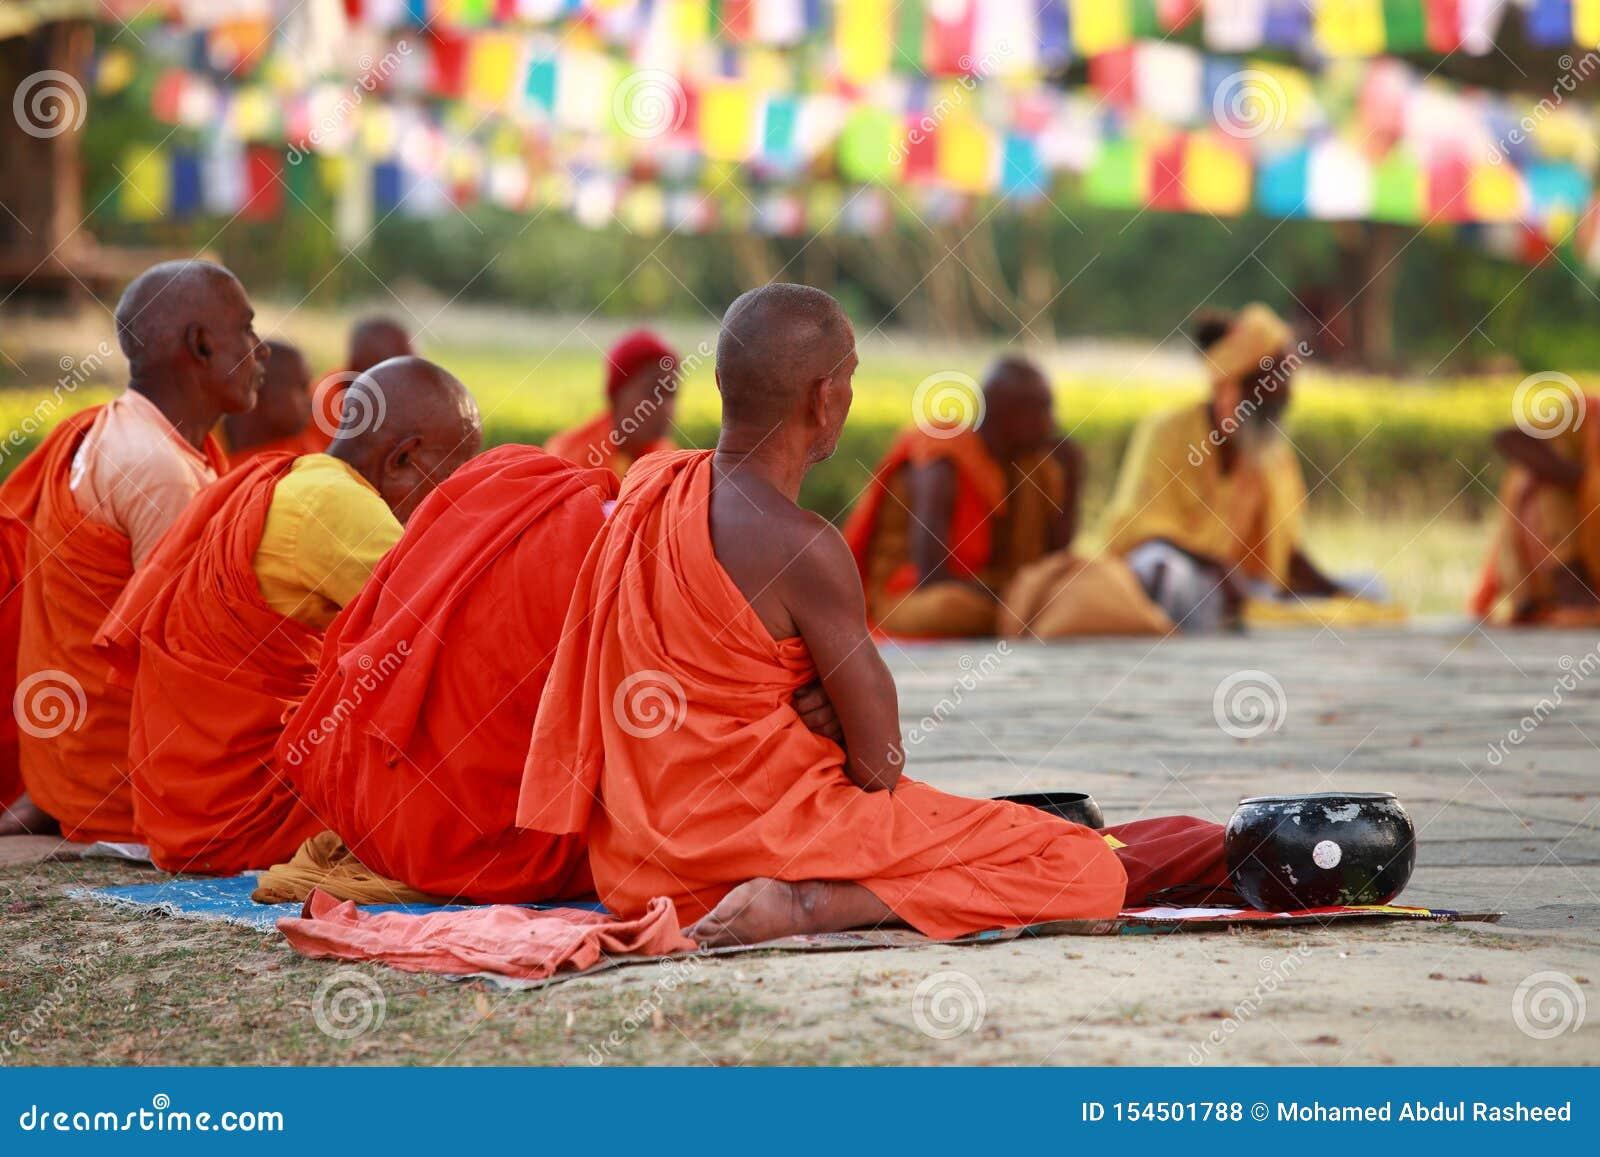 Buddhist Monks Meditation In Sitting Pose Editorial Stock ...